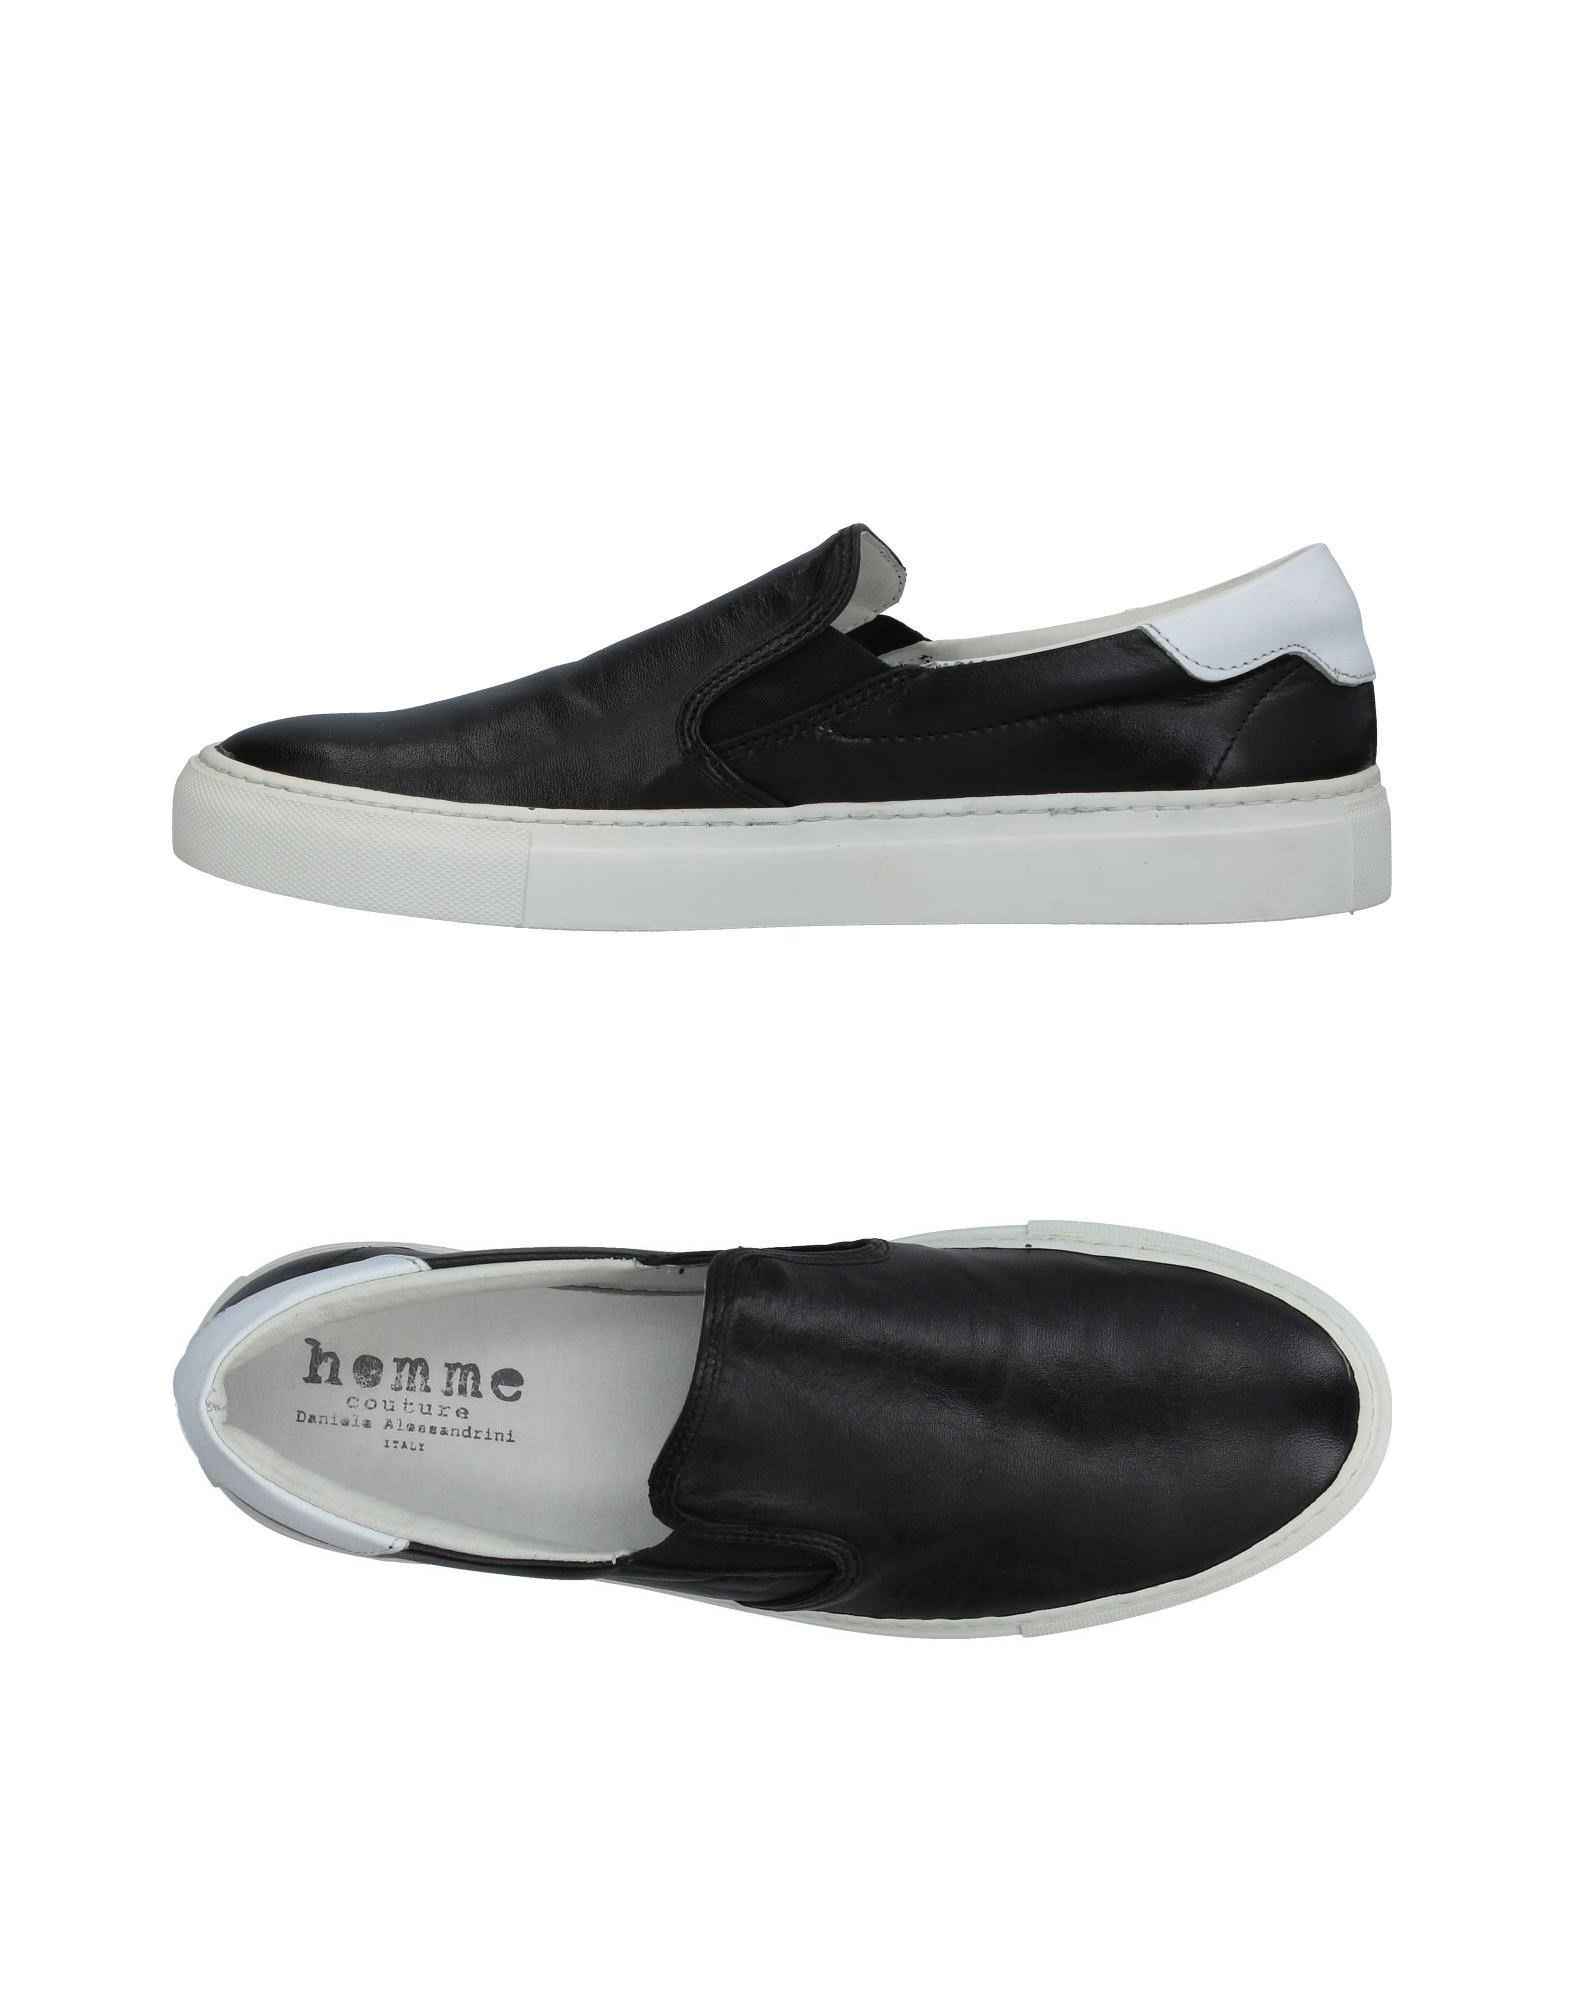 DANIELE ALESSANDRINI HOMME Herren Low Sneakers & Tennisschuhe Farbe Schwarz Größe 11 jetztbilligerkaufen